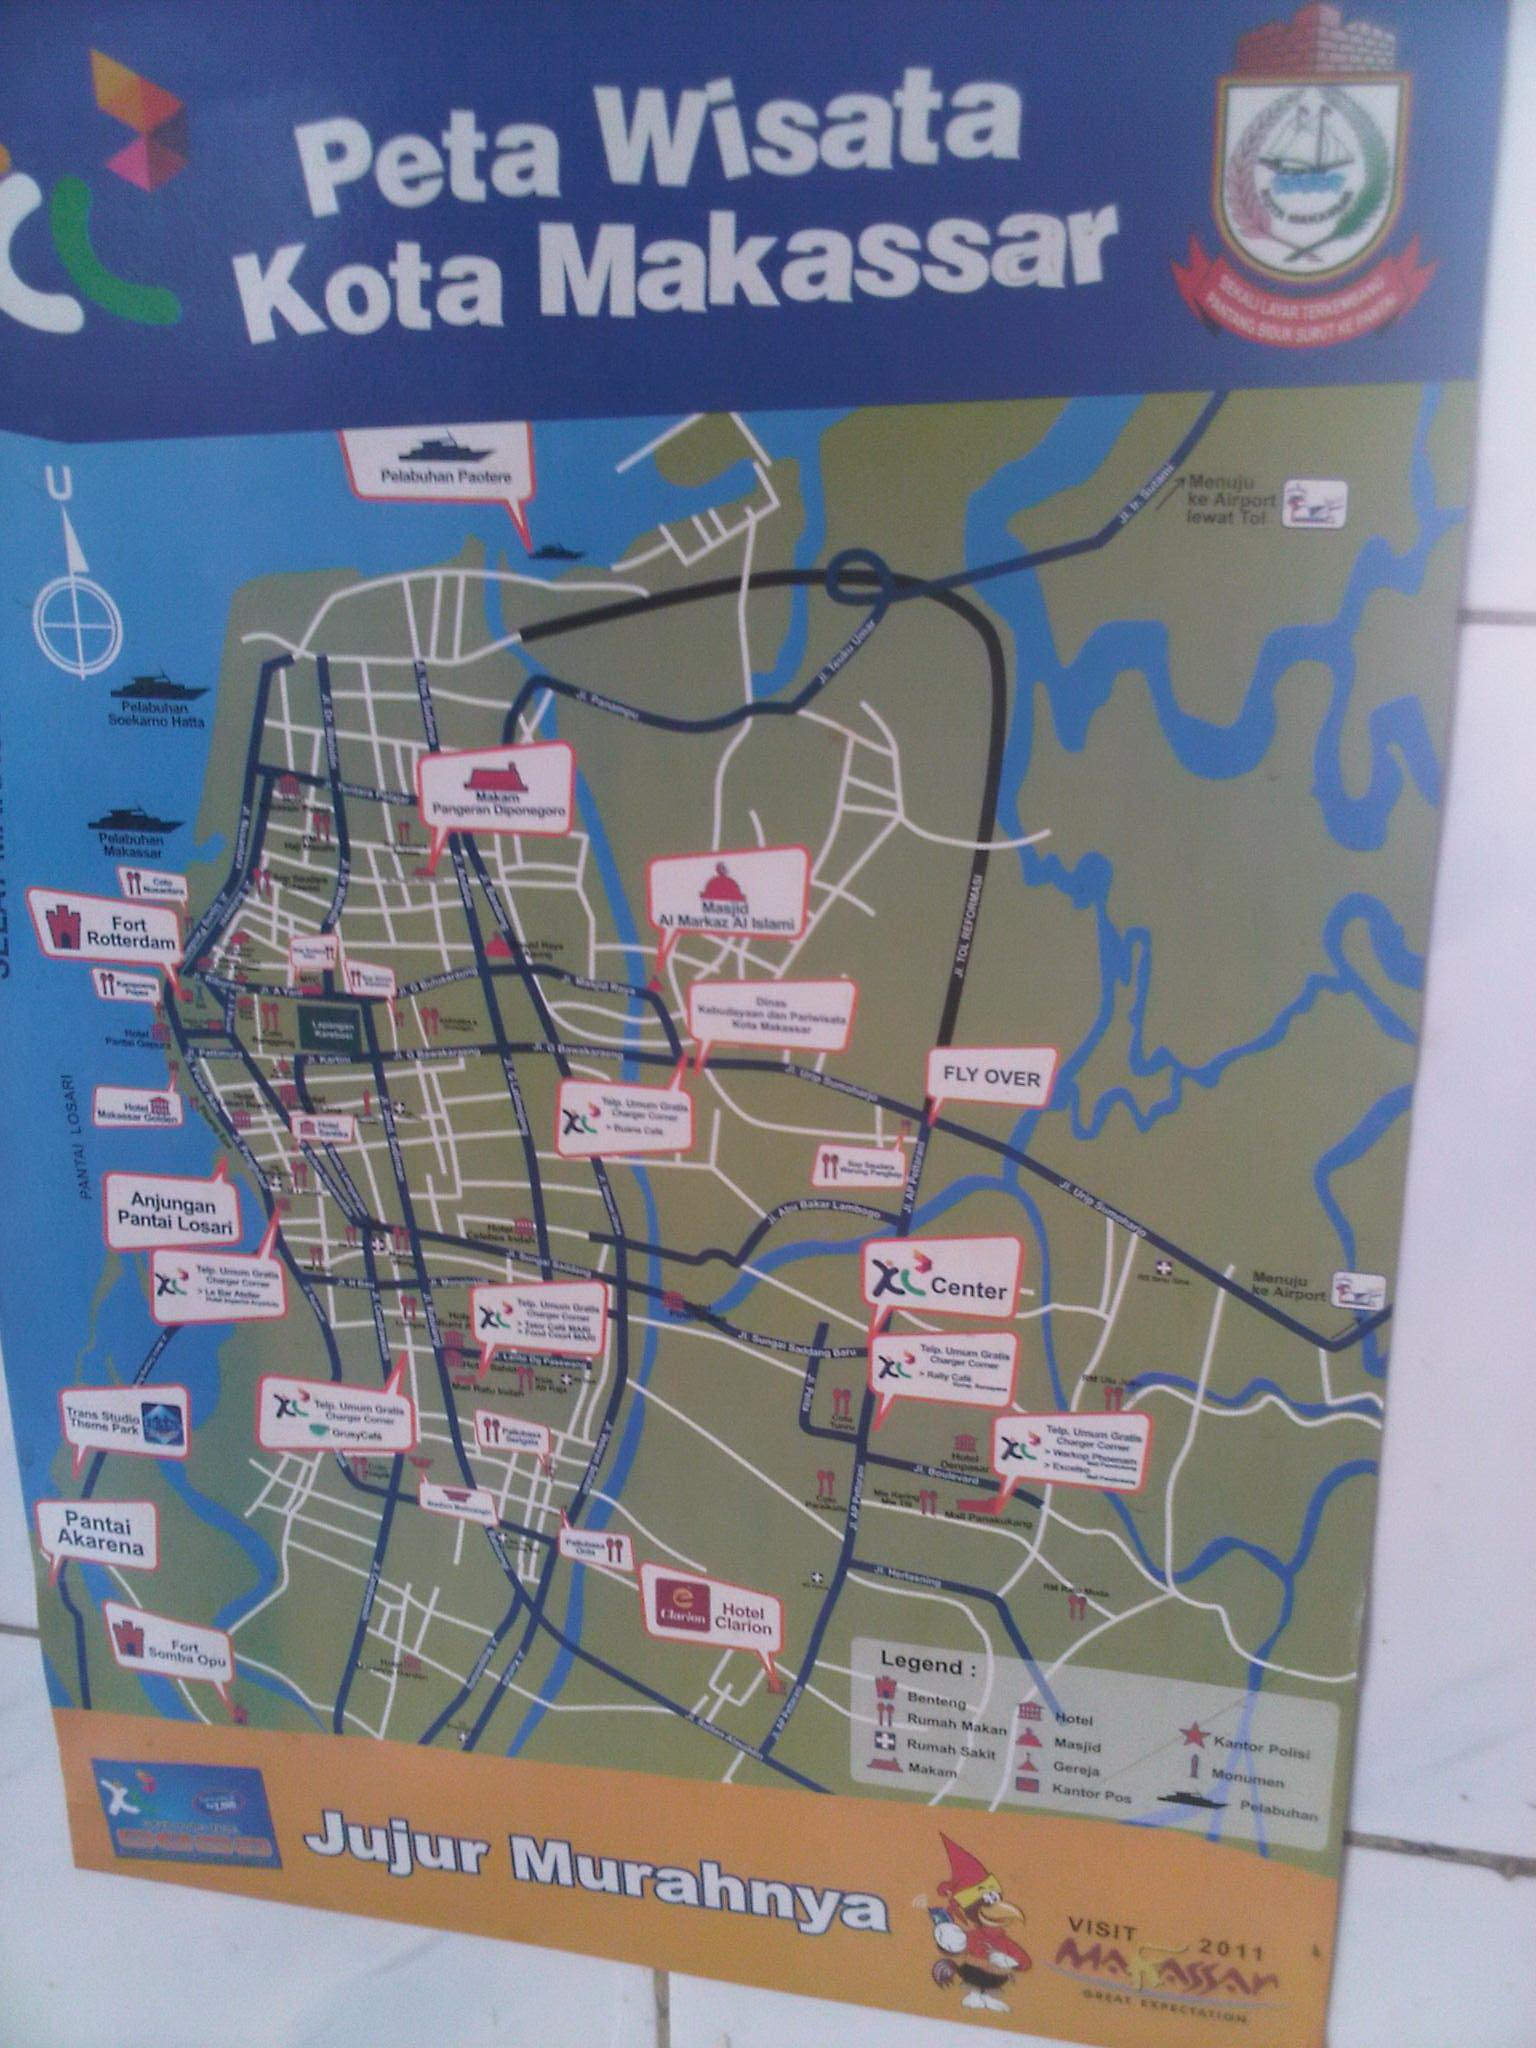 Peta Wisata Kota Makassar